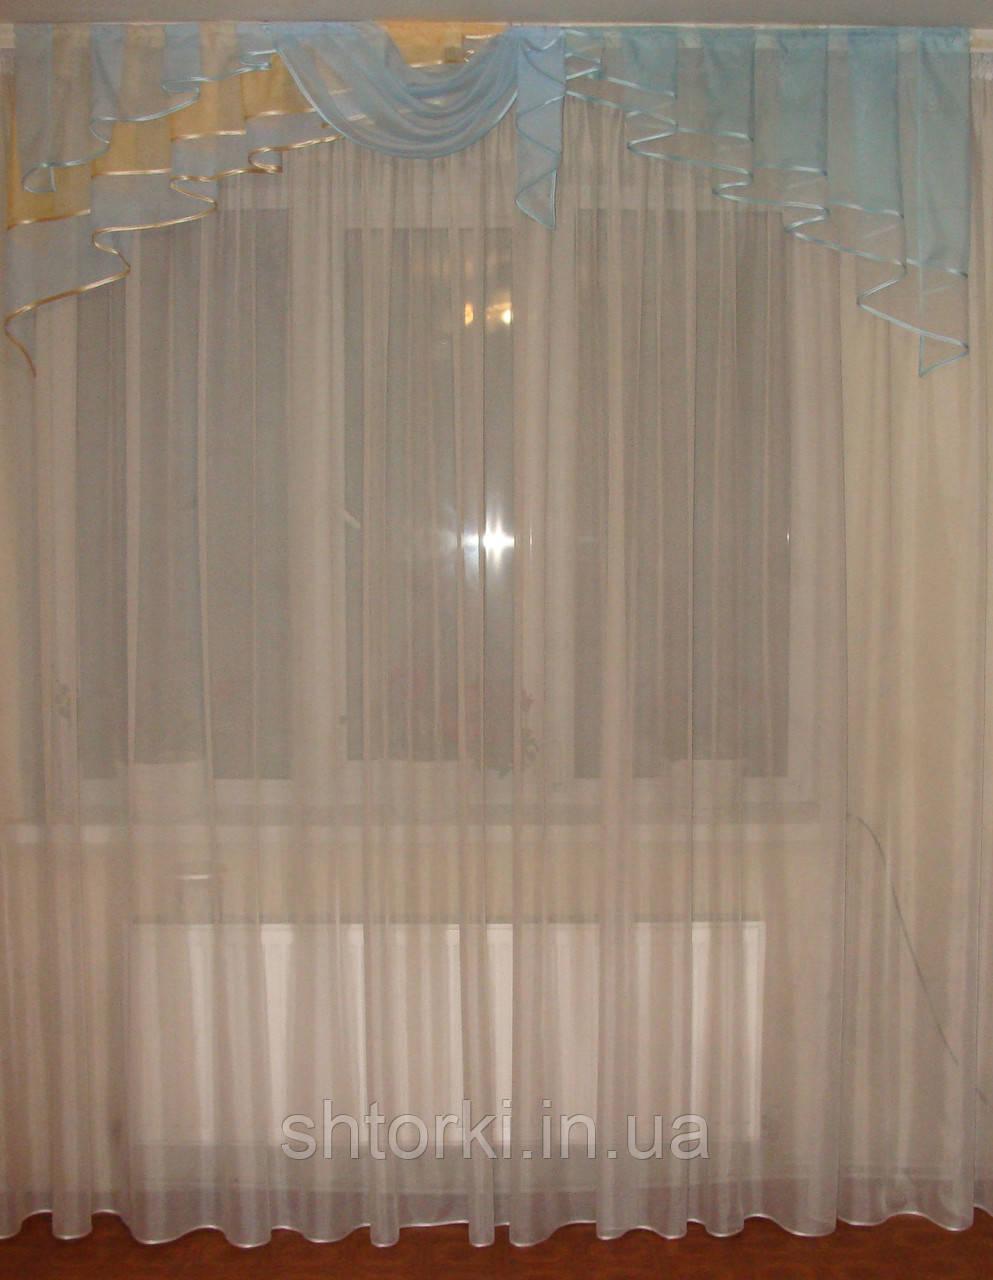 Ламбрекен Дуга голубой, 2м